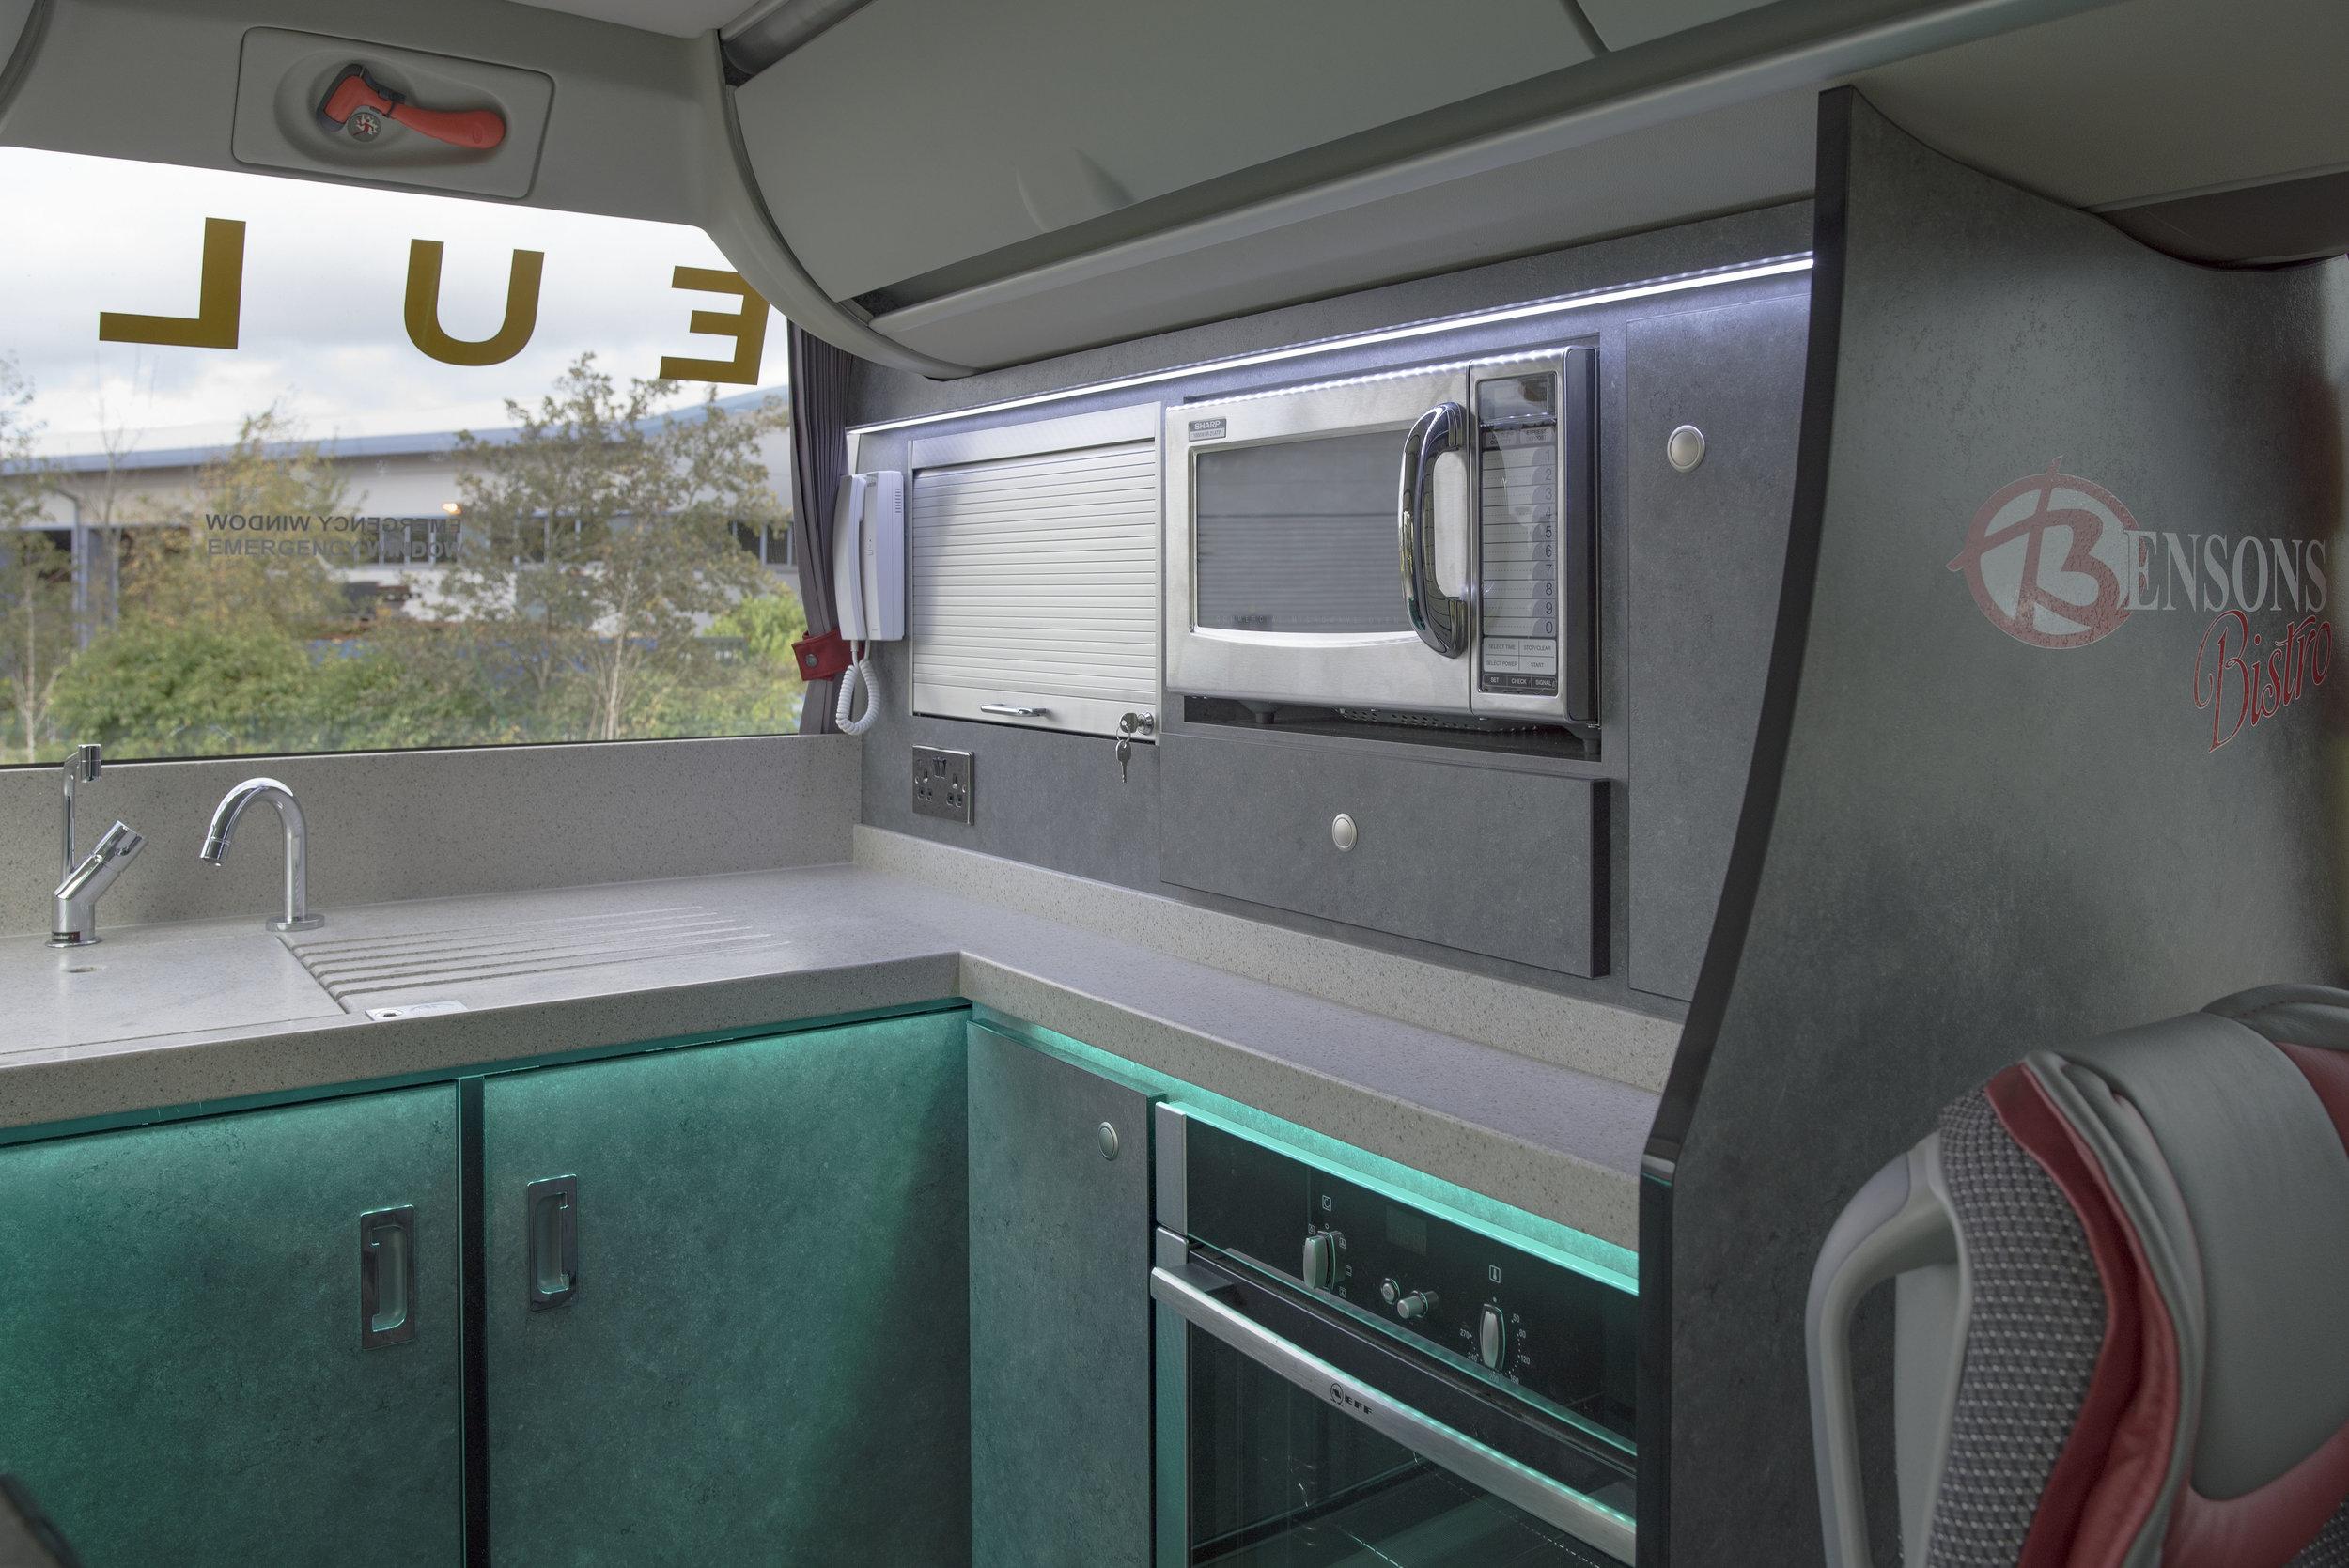 Bensons Rear Kitchen